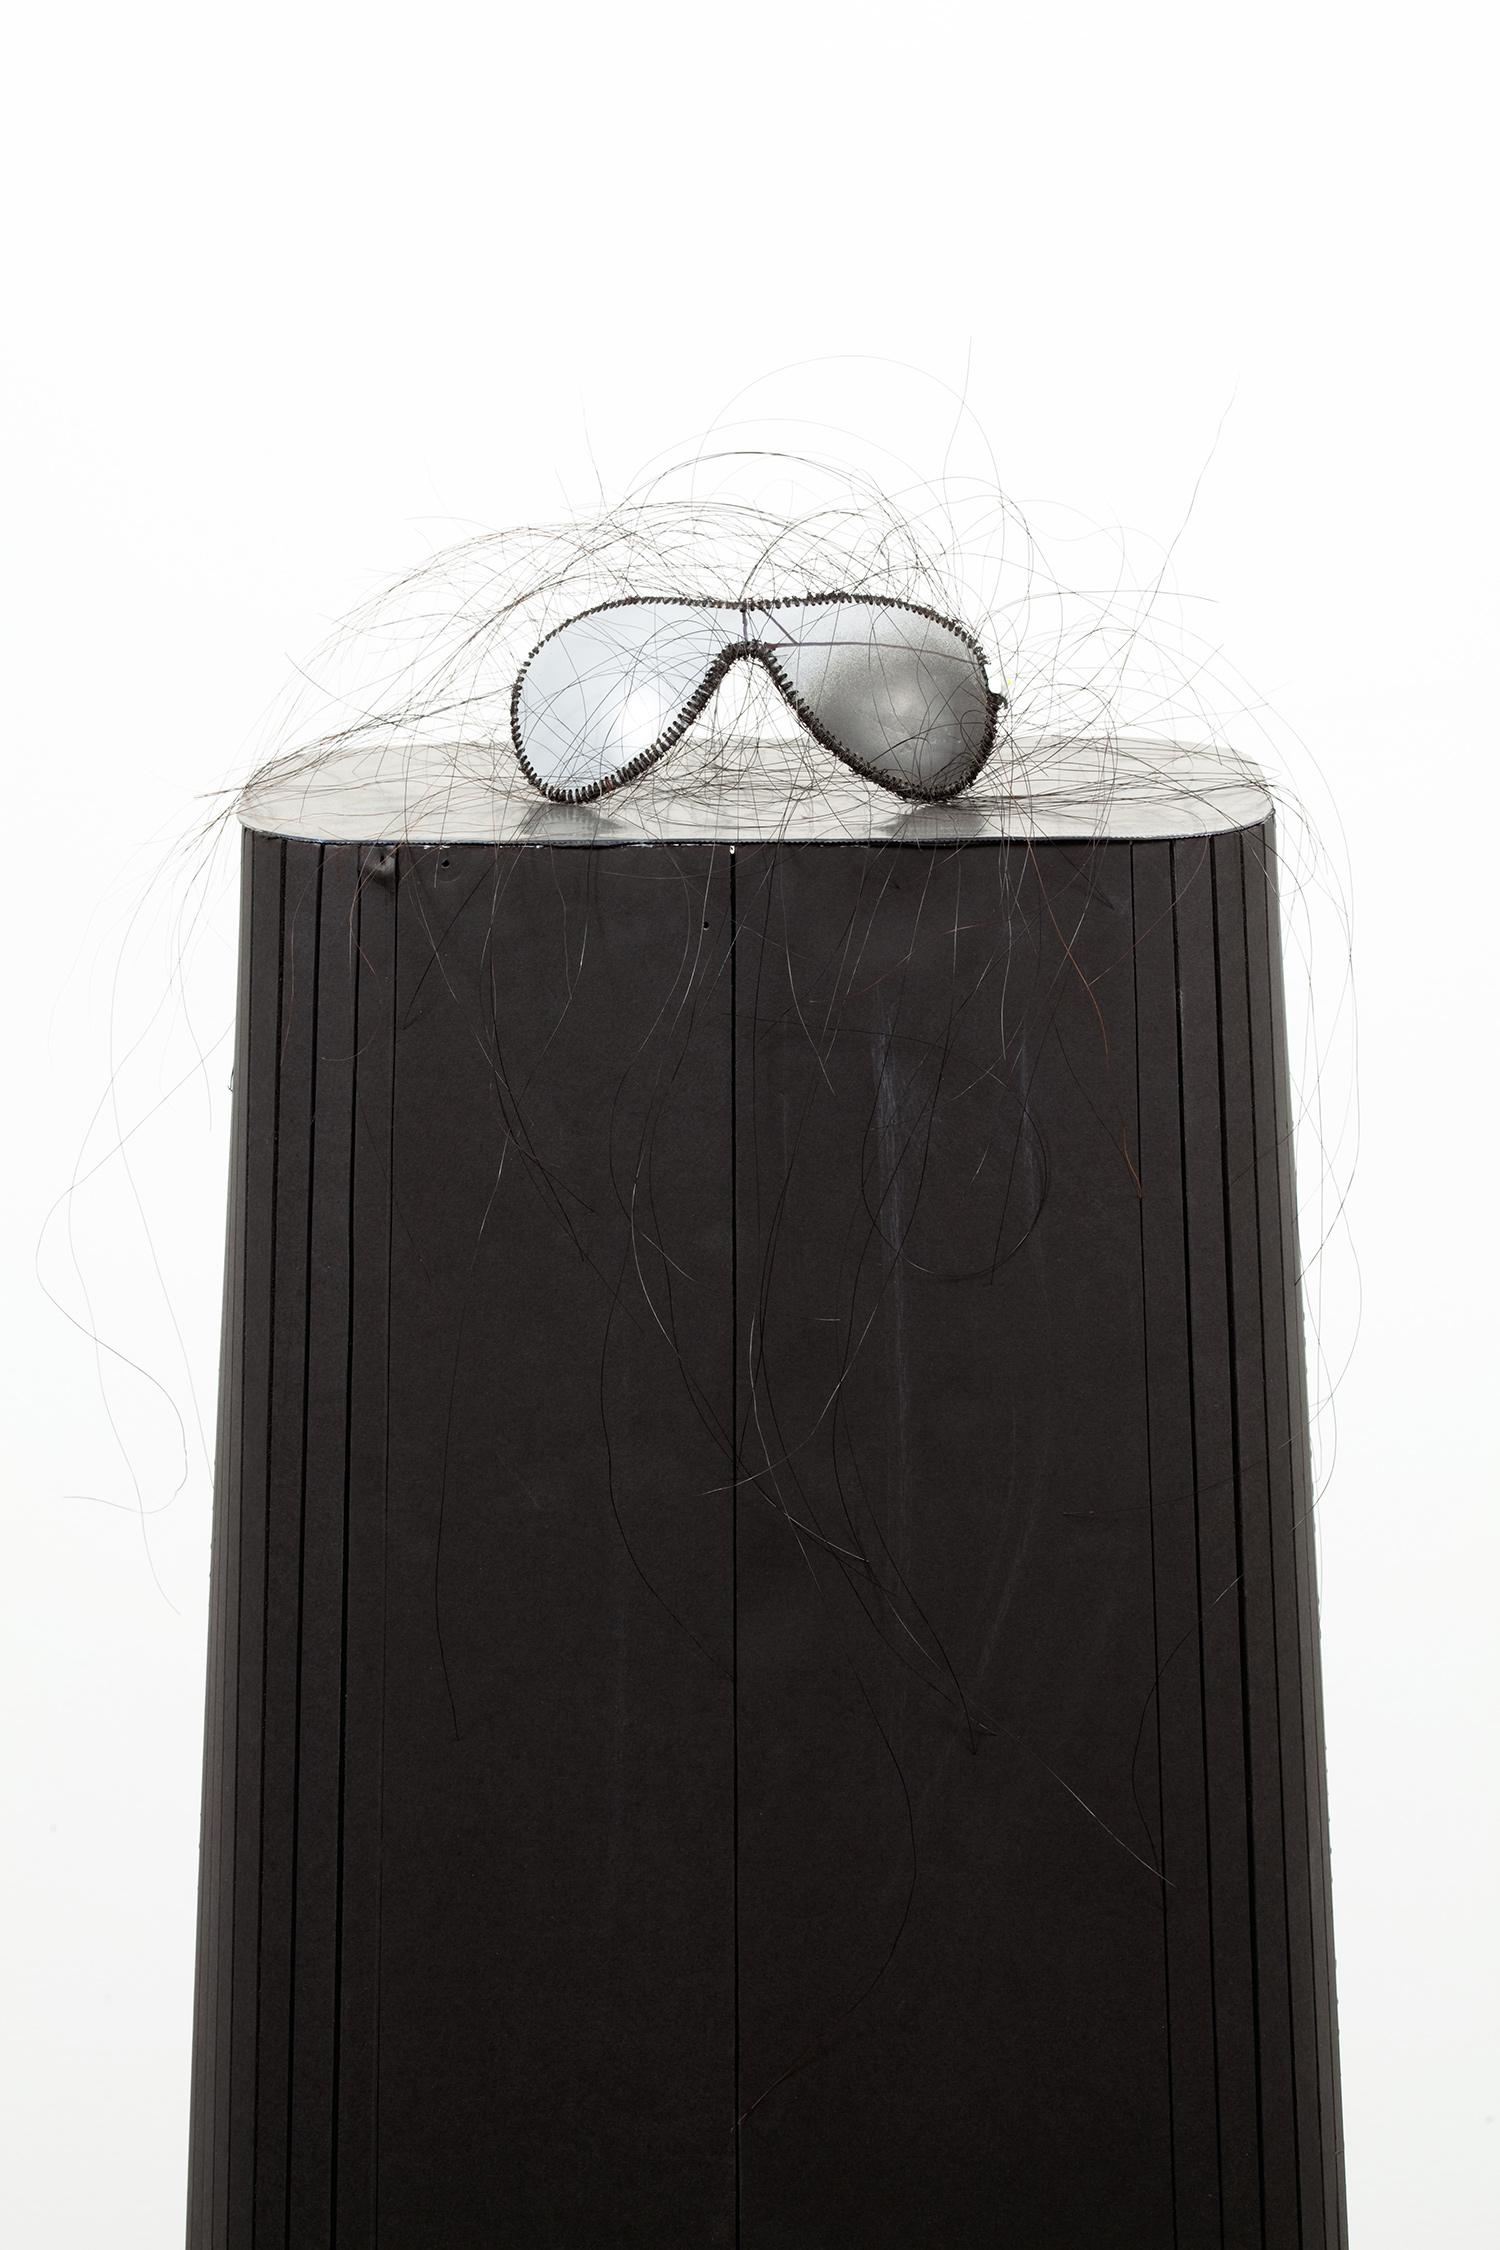 "Trouble. Detail. Horsehair, Labor Boss sunglasses, foam core, lead, stolen, fabric kernel. 55"" x 11.5"" x 6.5"". 2009."